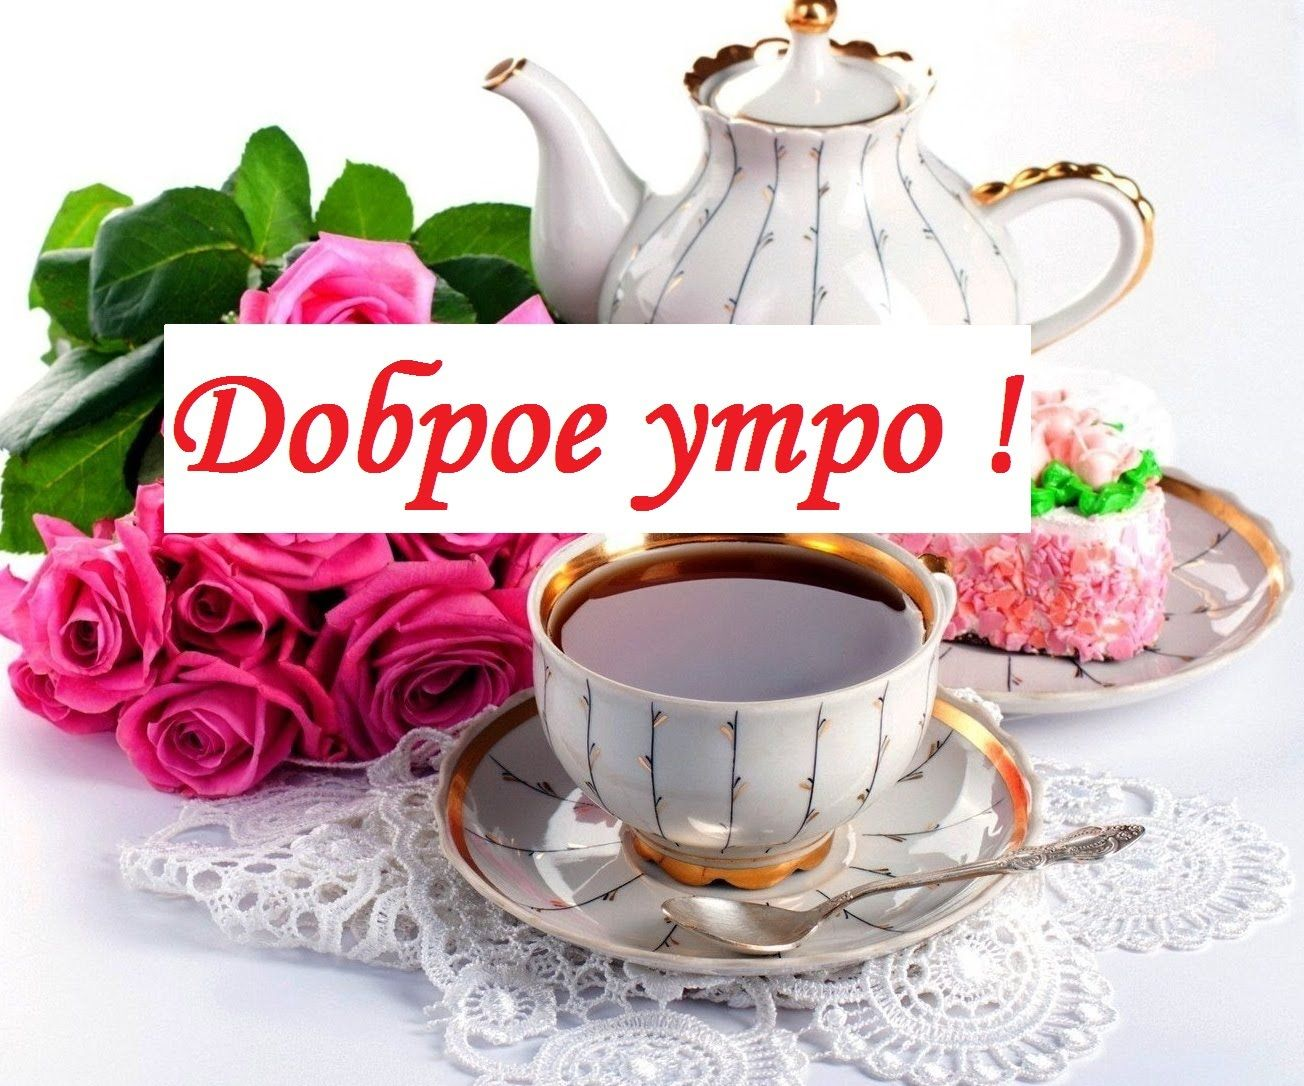 Dobroe Utro с добрым утром Russisch